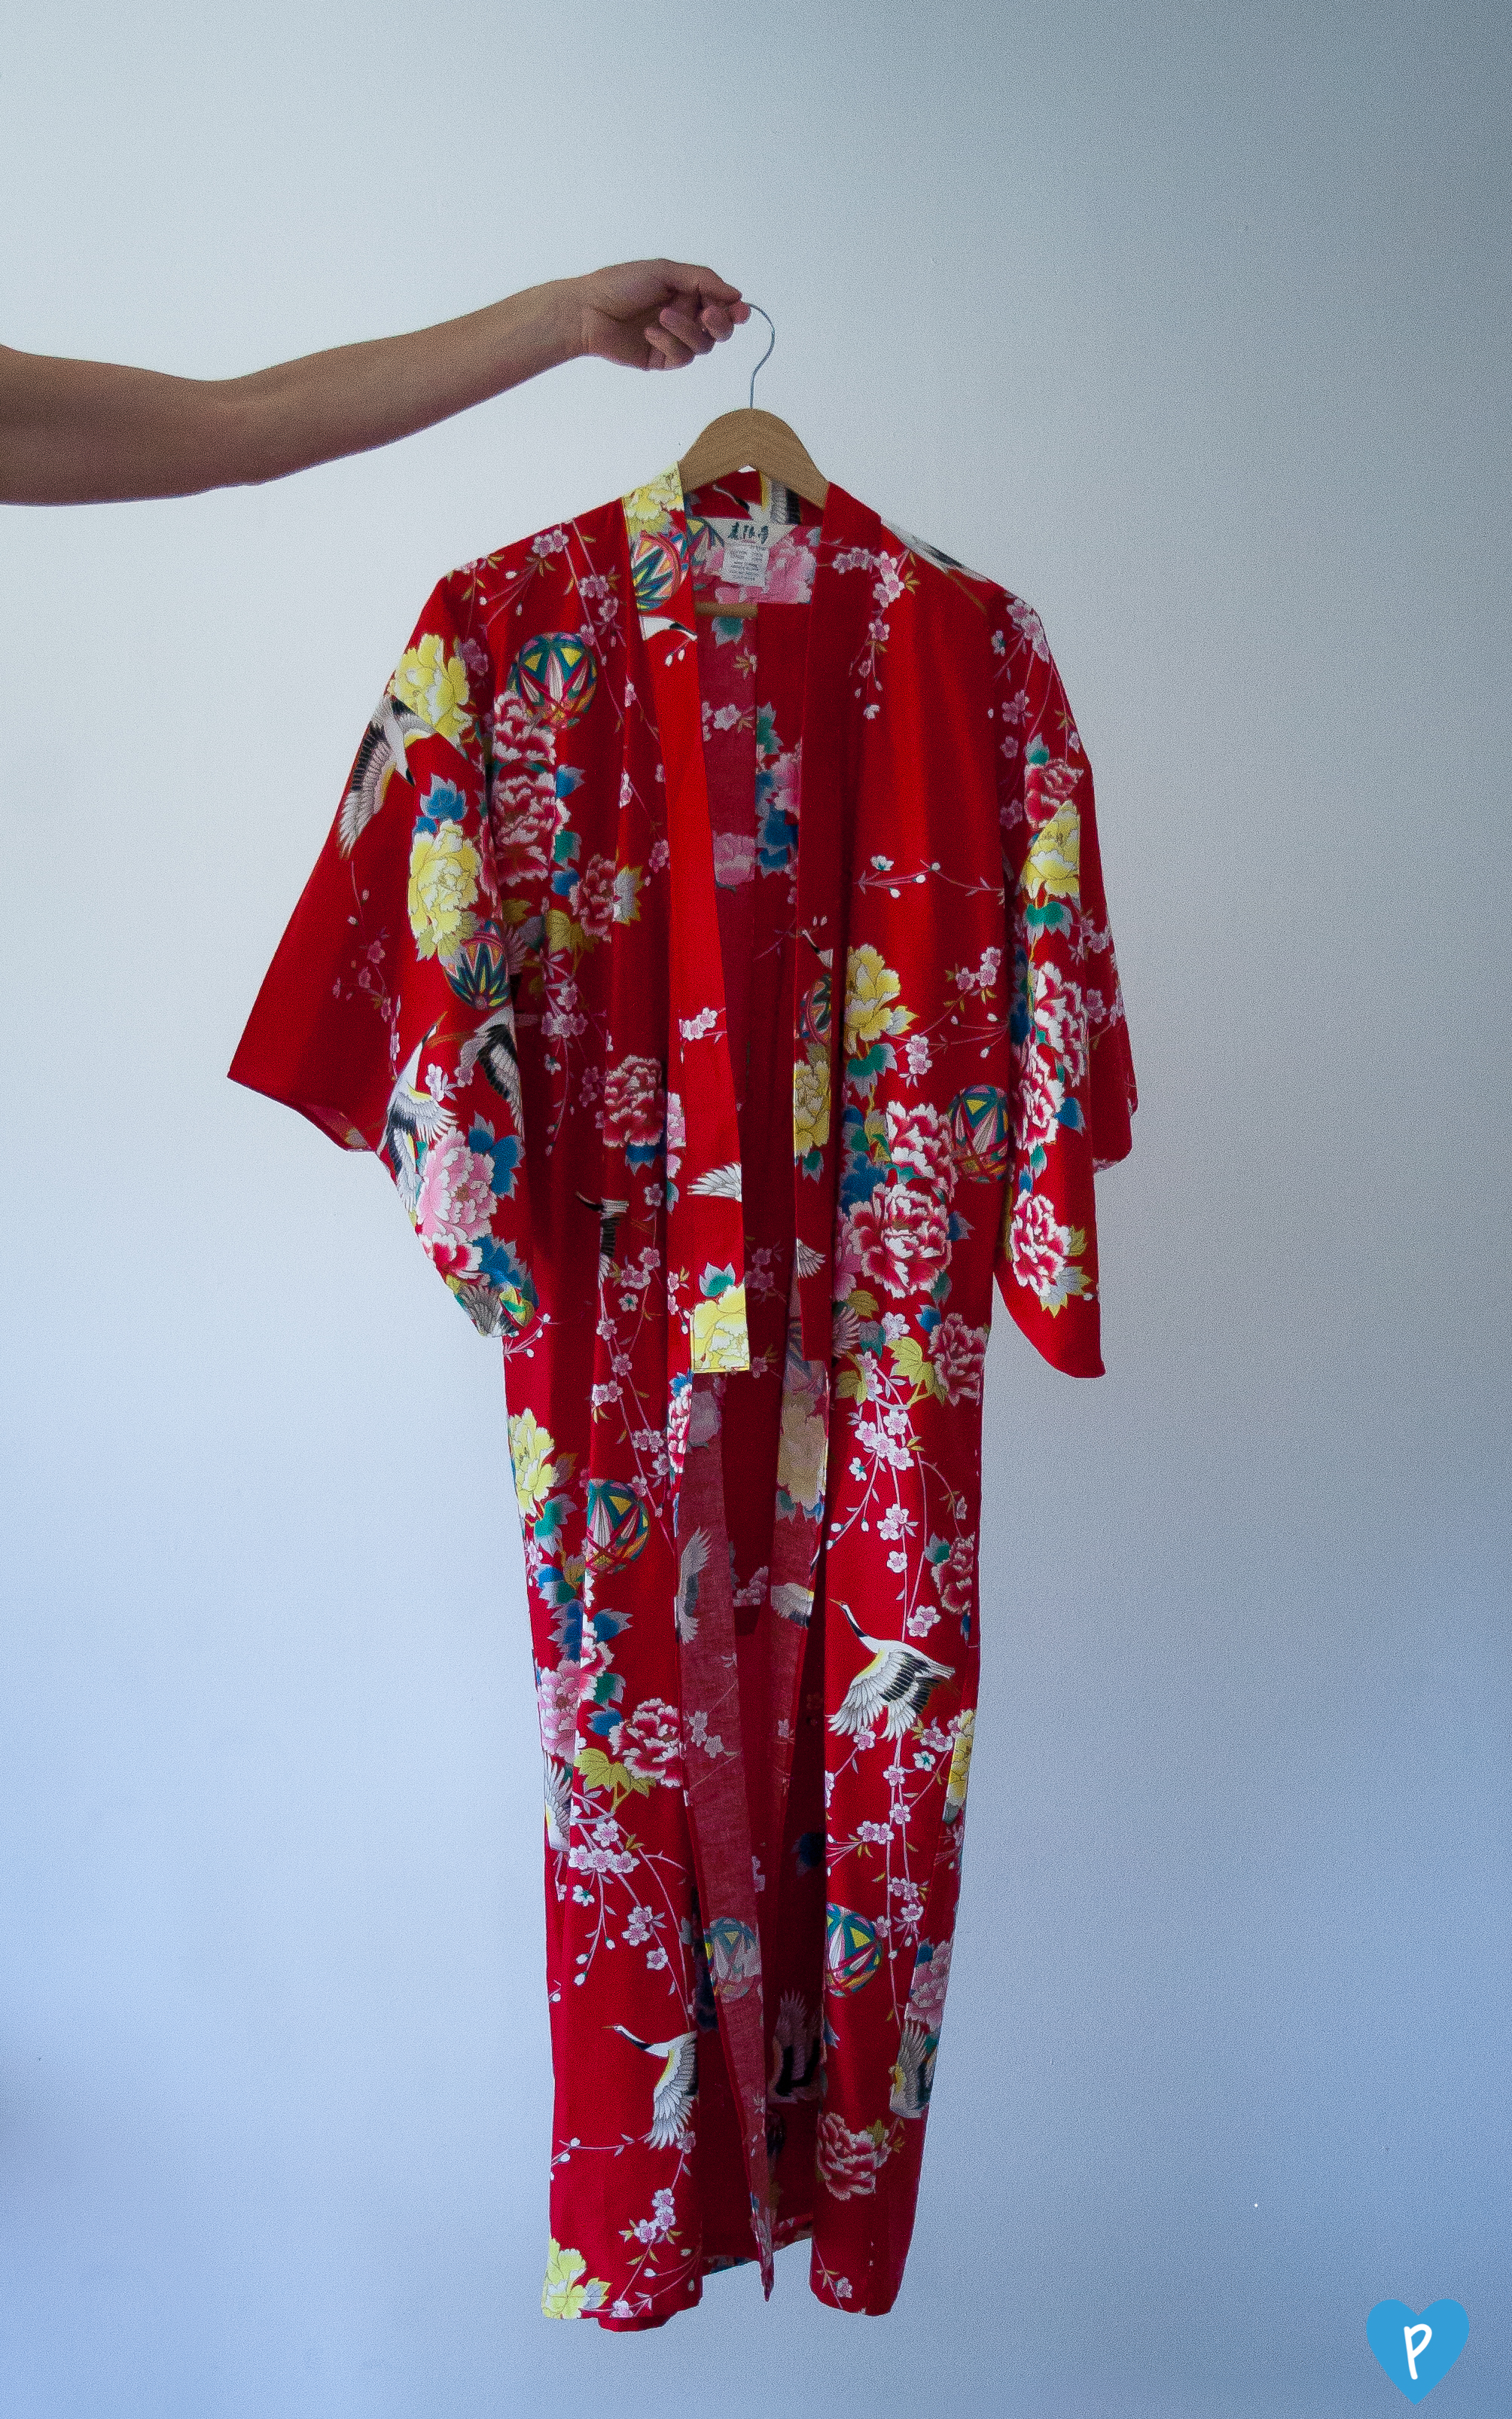 Cotton robe options.